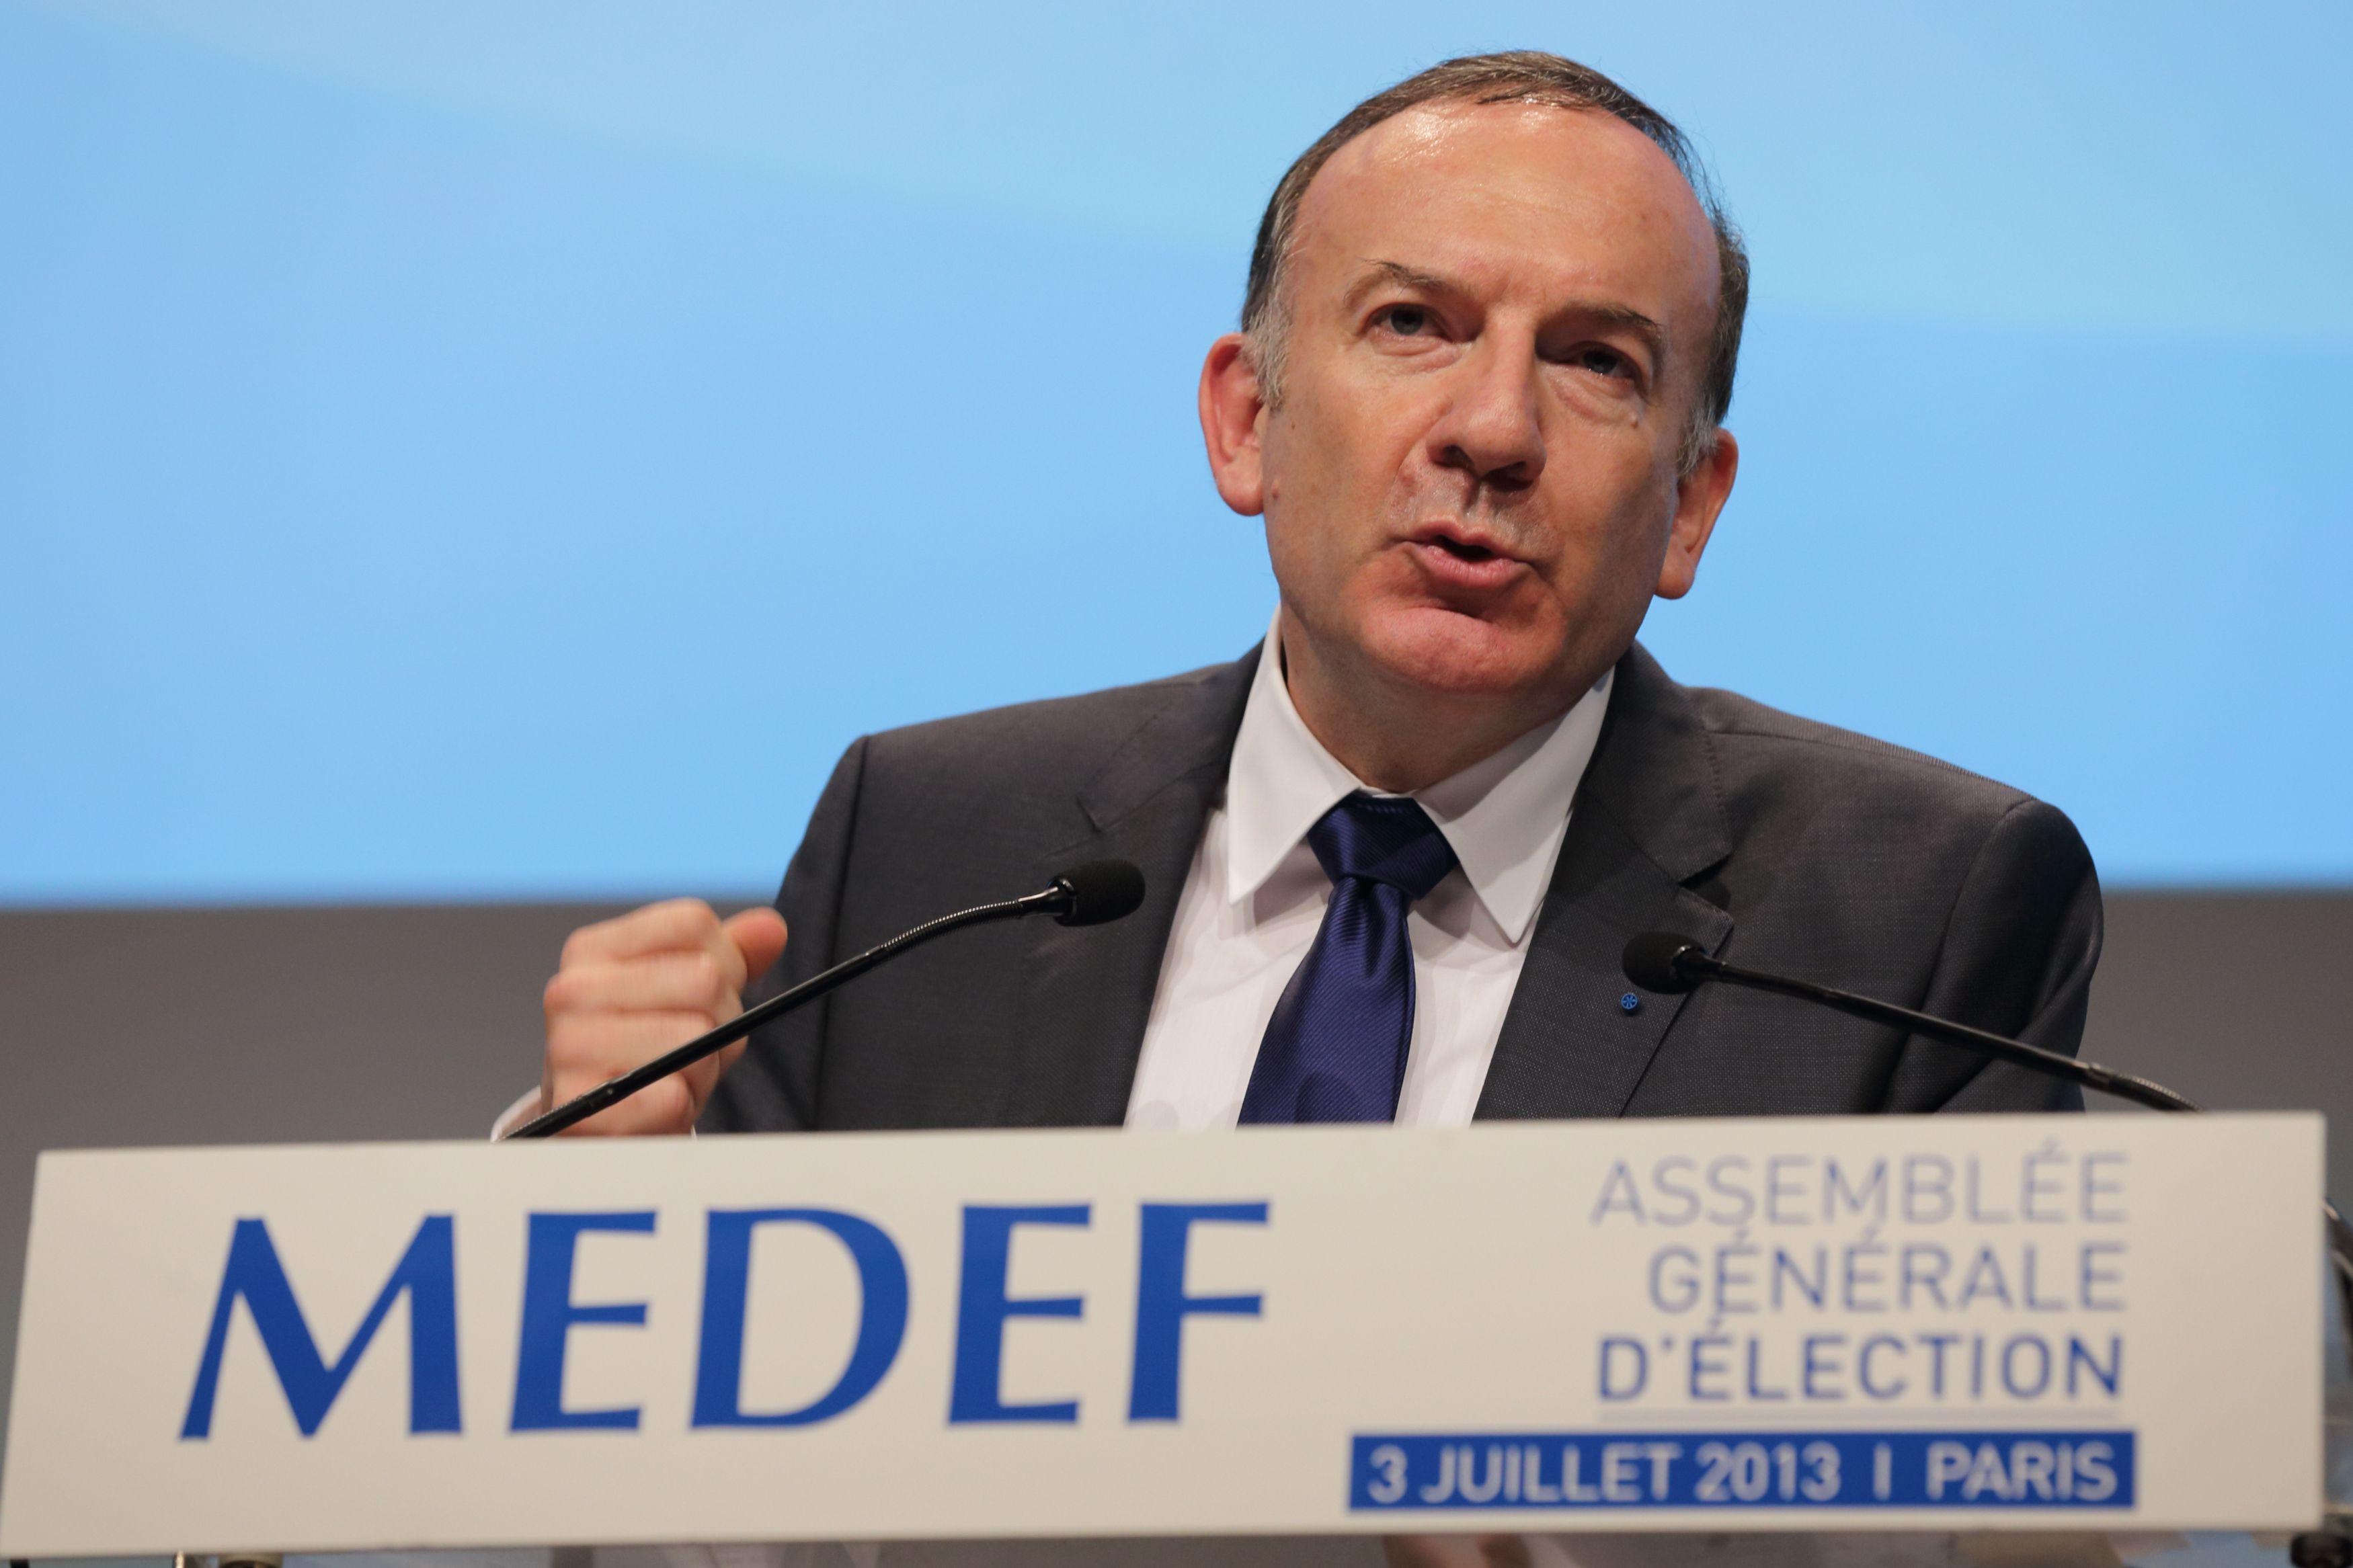 Le Medef, vraiment libéral ?